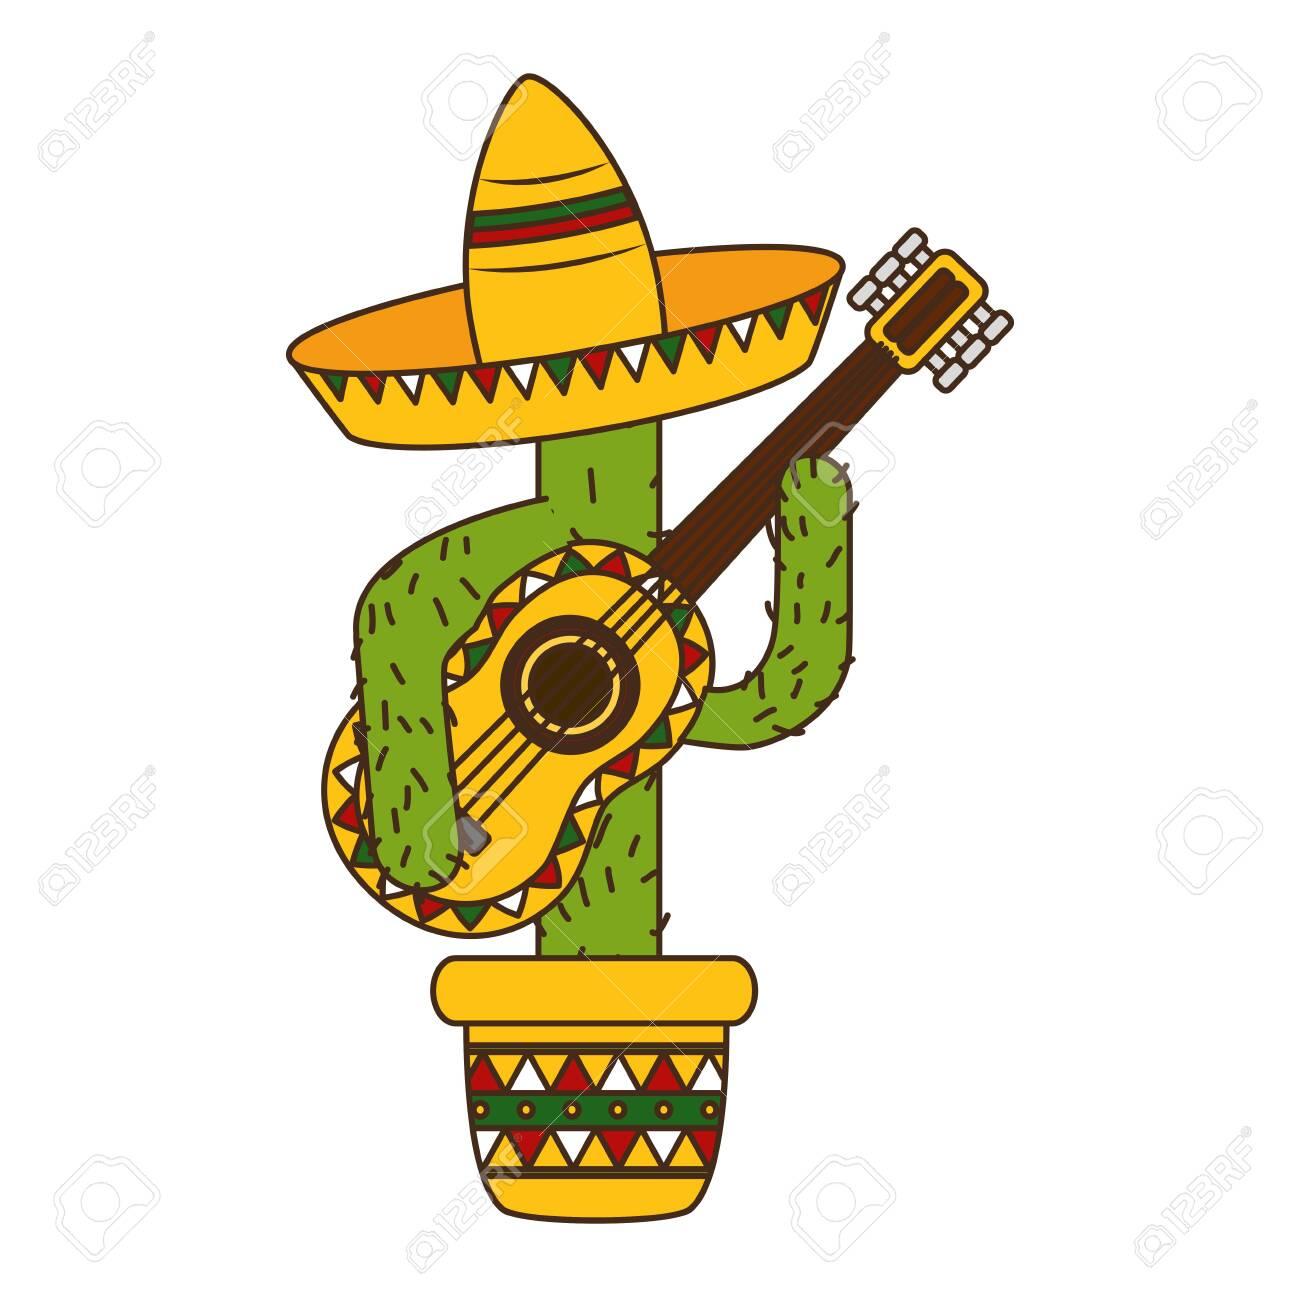 cactus with hat and guitar mexico cinco de mayo vector illustration - 129482670